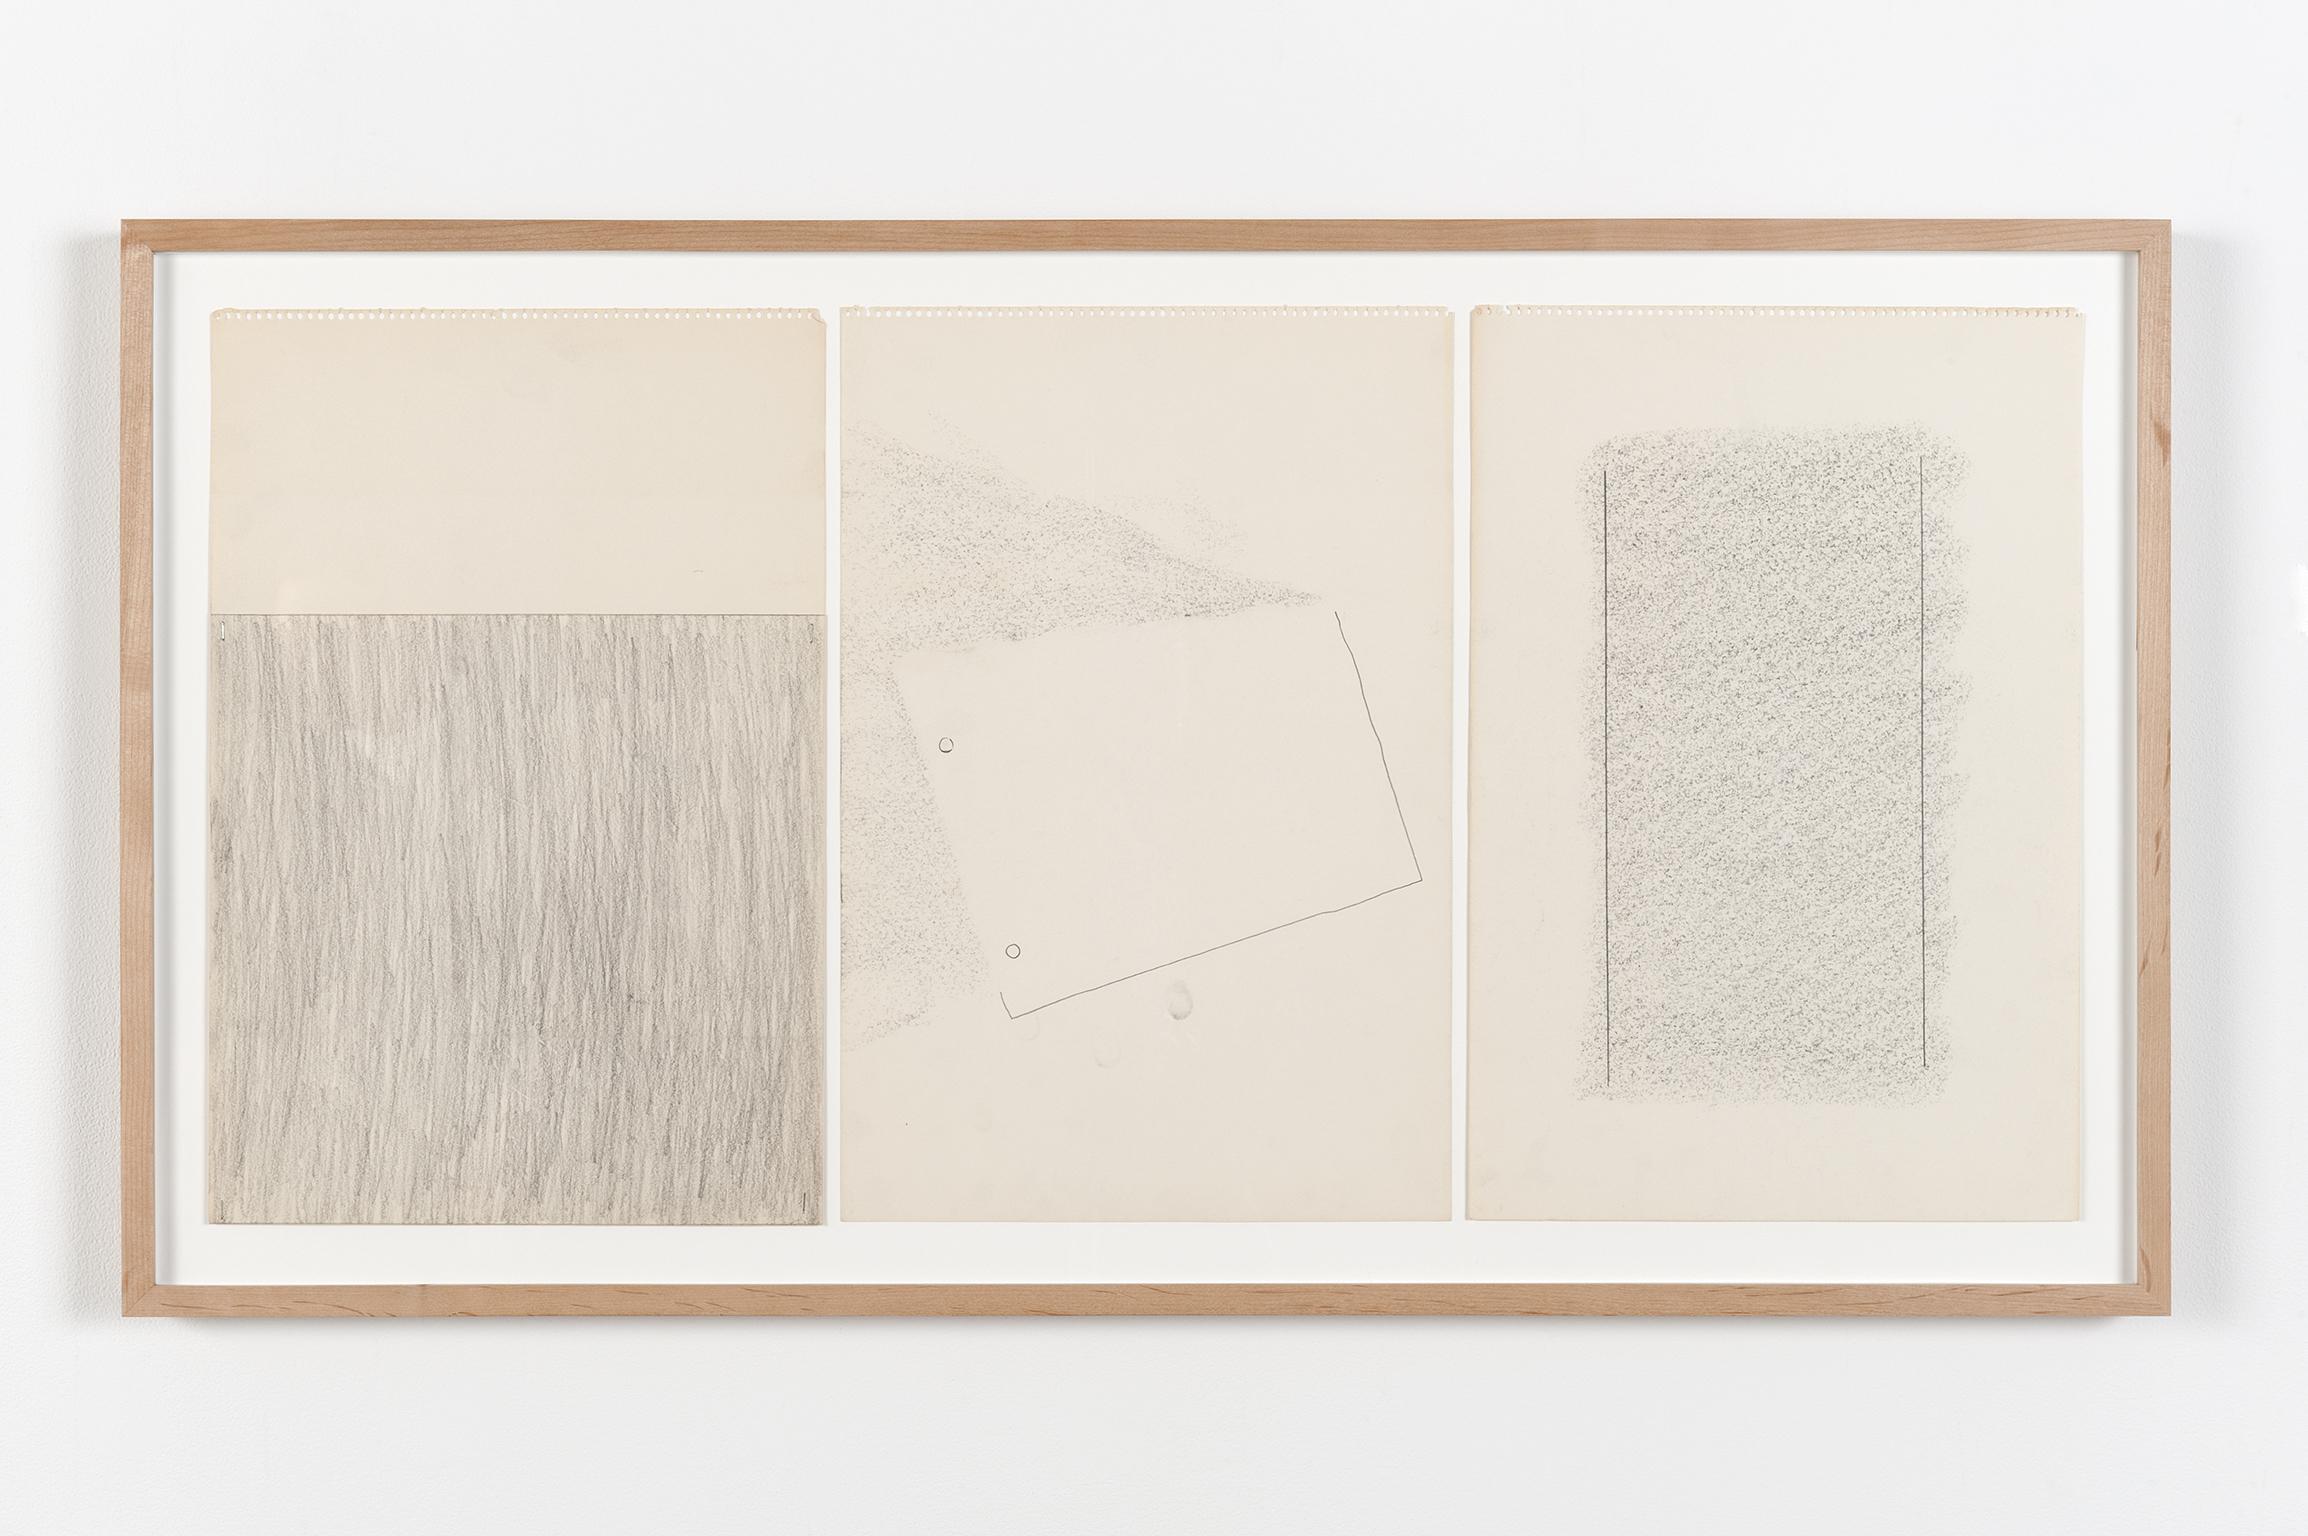 Robert Kleyn, Untitled, 1969–1970, graphite on paper, 22 x 40 in. (55 x 102 cm)   by